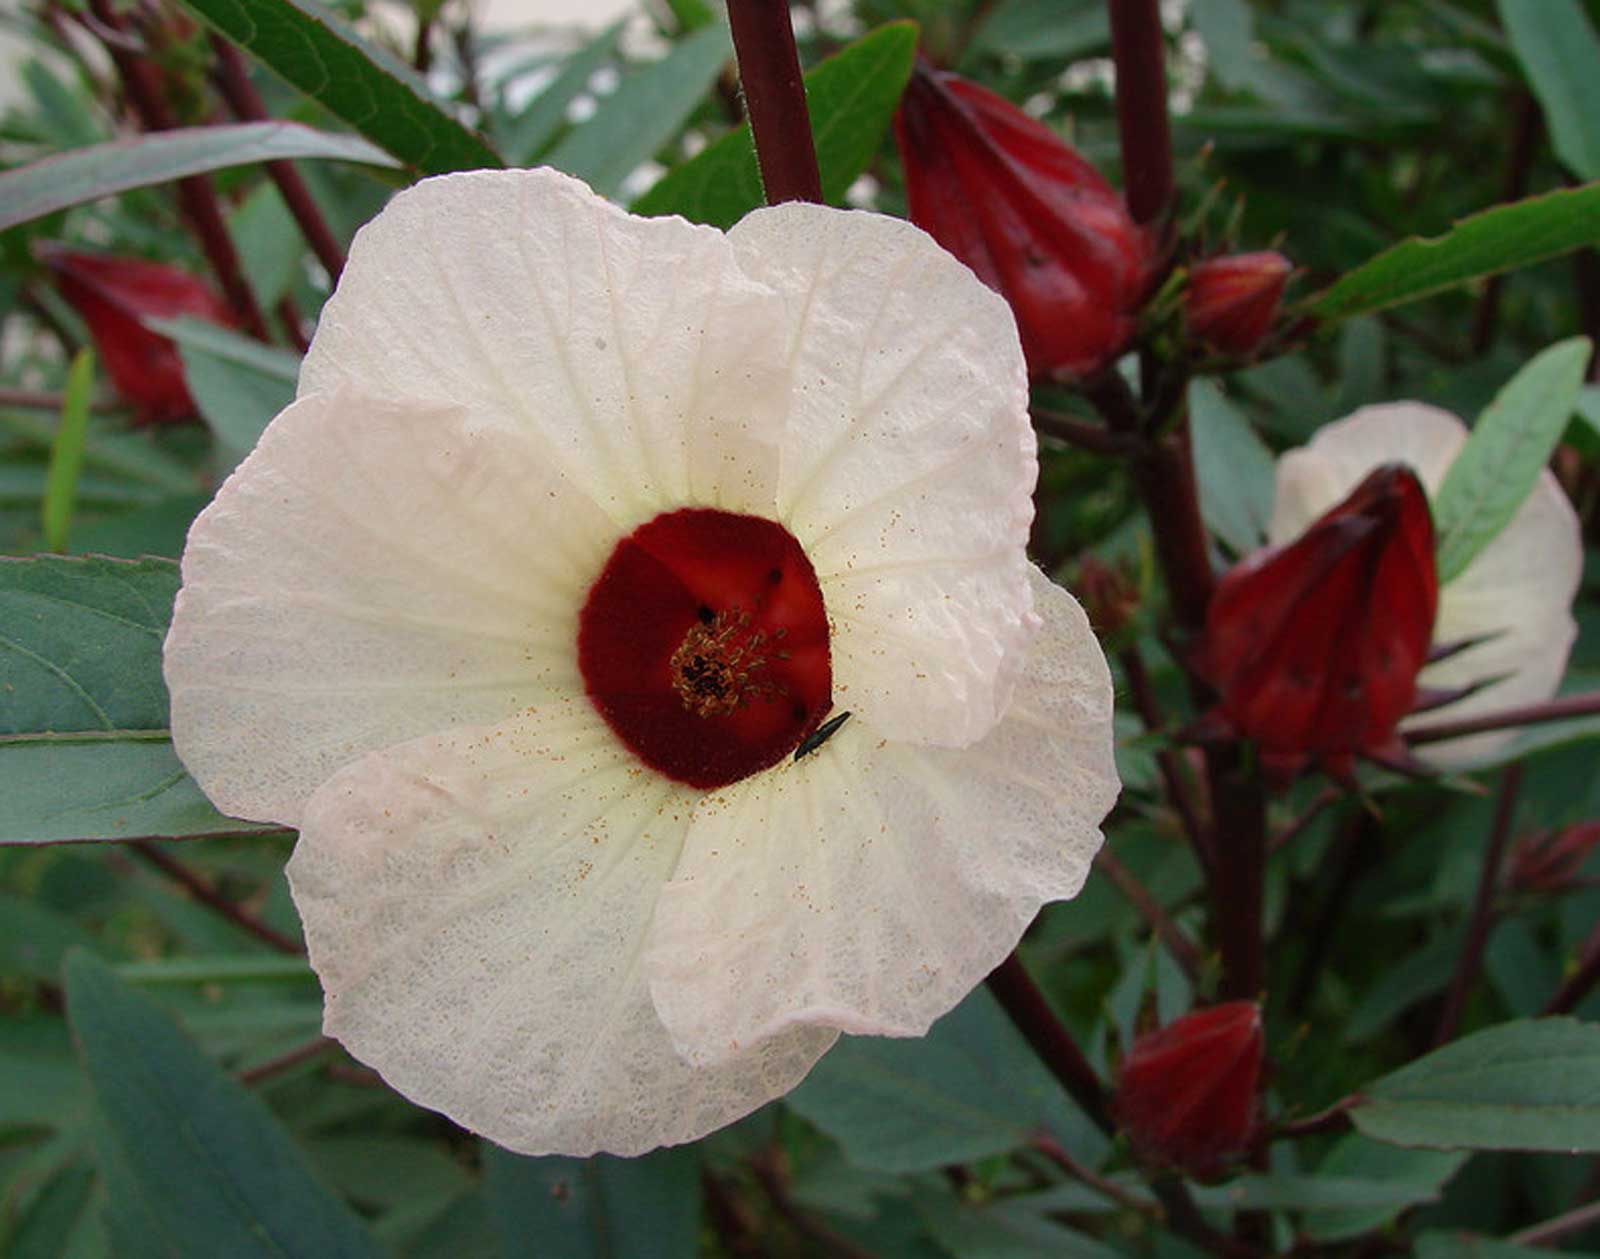 Hibiscus sabdariffa roselle jamaican tea maple leaf hibiscus hibiscus sabdariffa roselle jamaican tea maple leaf hibiscus 20seeds larger image izmirmasajfo Choice Image